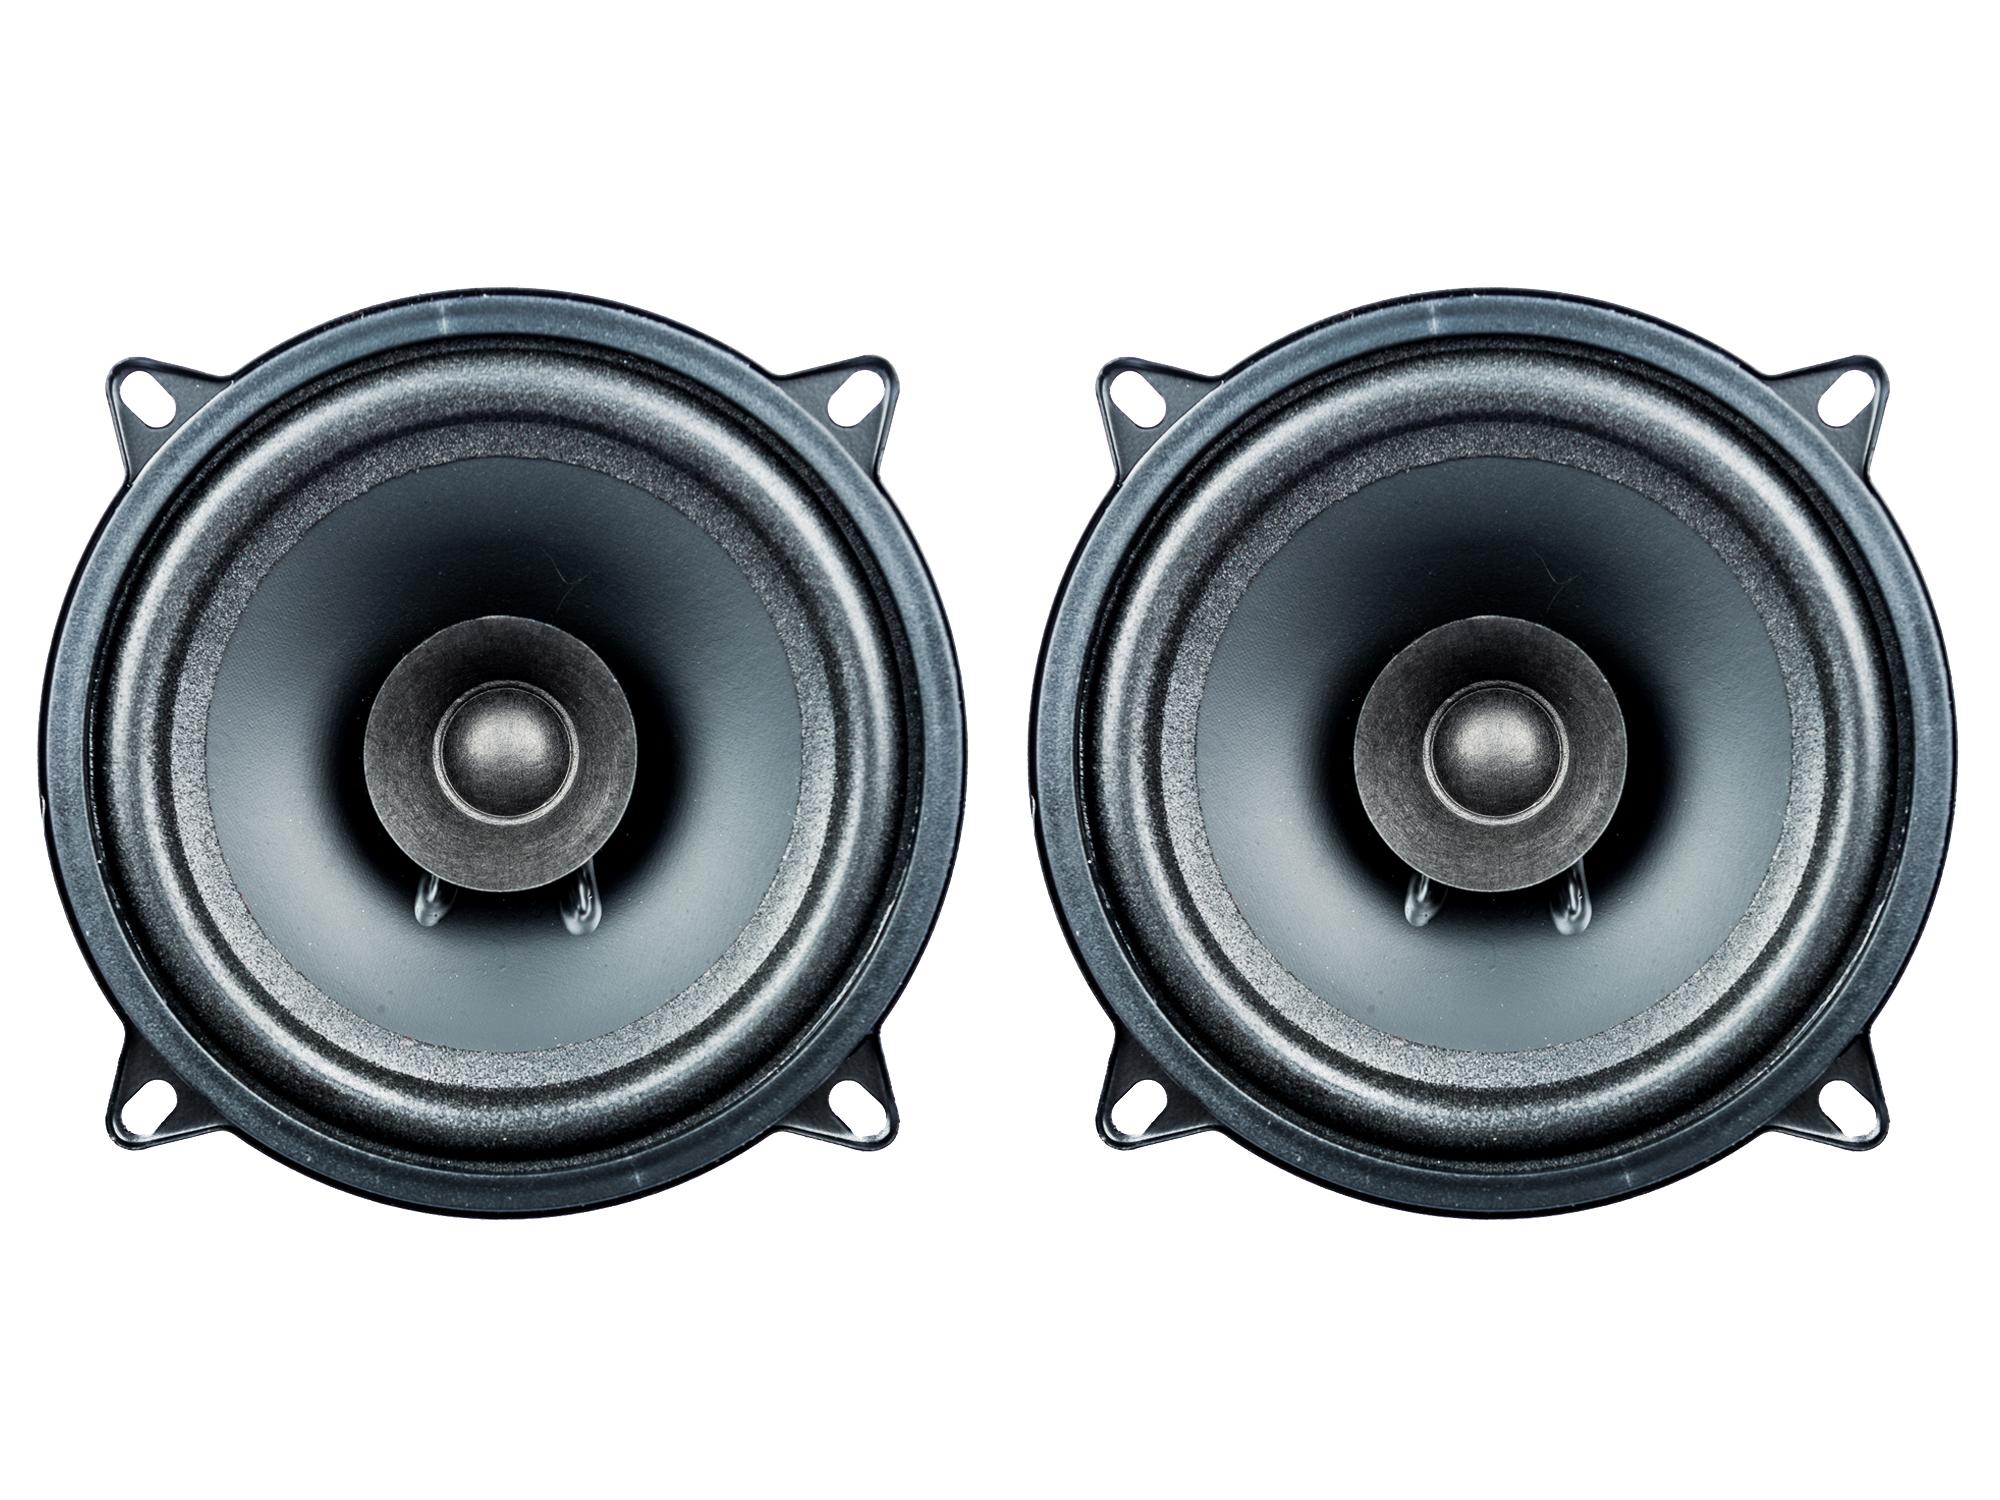 1 Paar PG Audio EVO I 13.2, 13 cm Dual Cone Lautsprecher passend für Chrysler,Citroen,Dacia,Ford,Opel,Peugeot & Renault – Bild 2